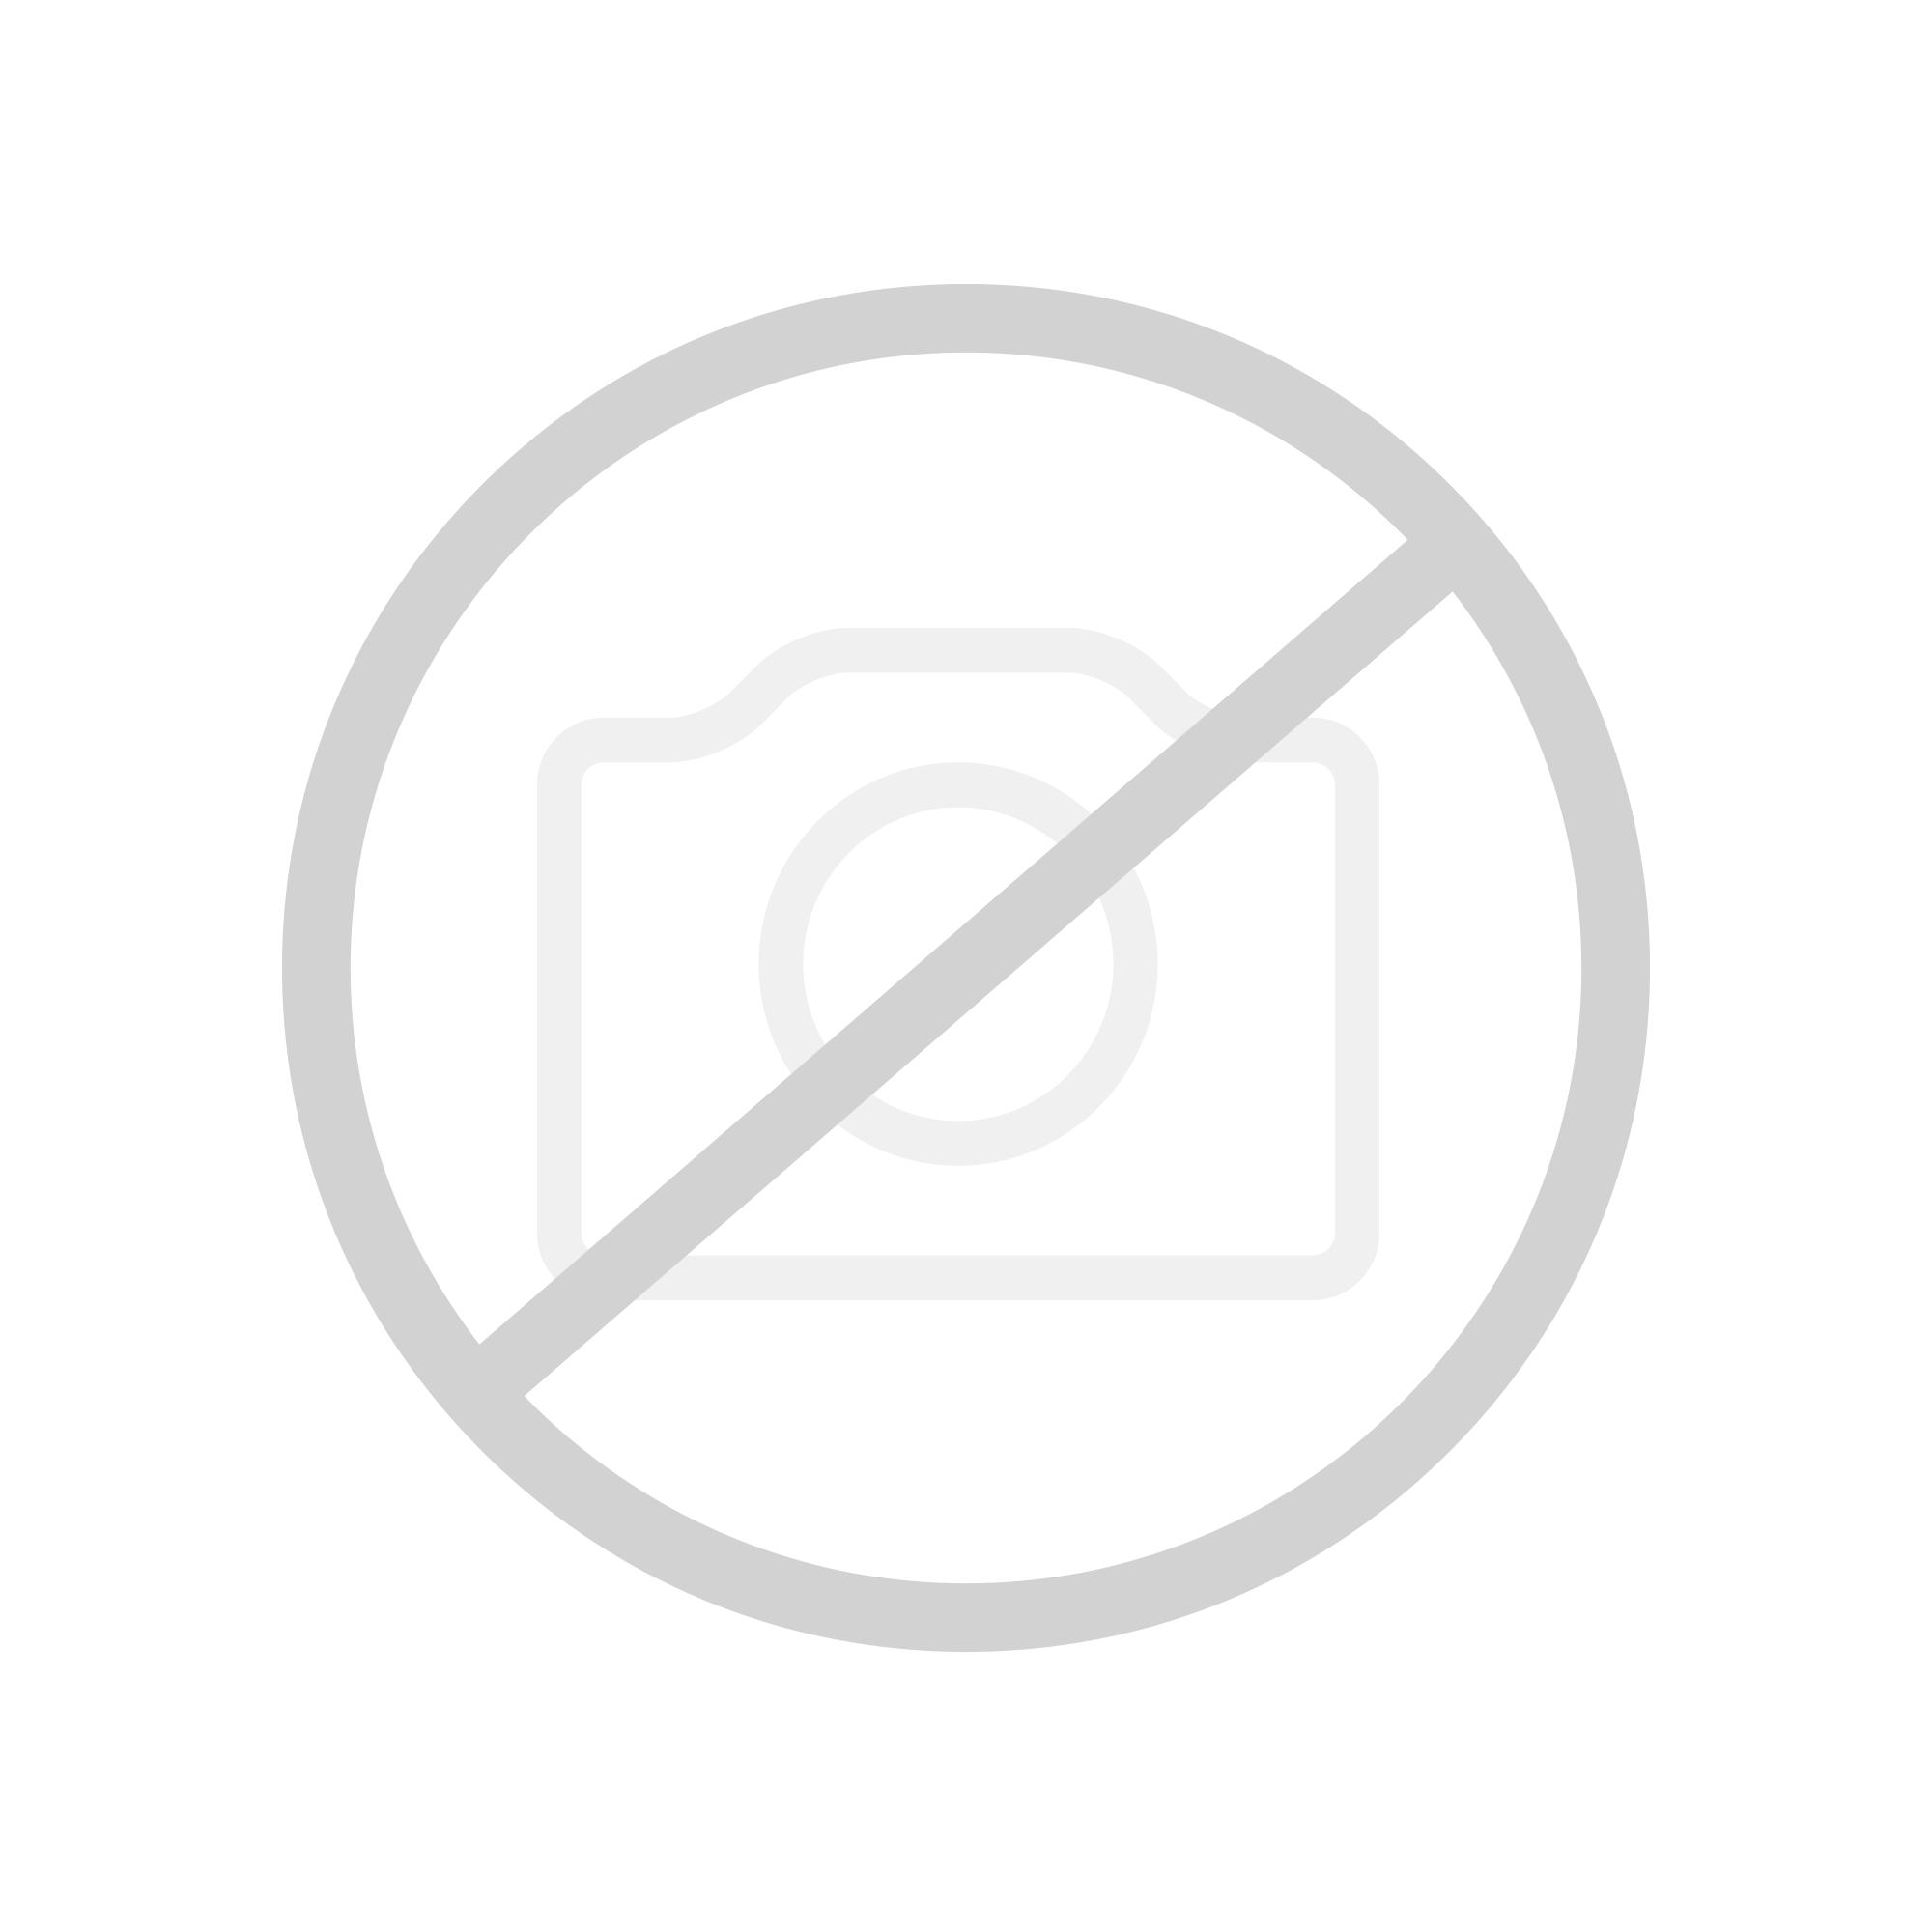 kaldewei puro duo rechteck badewanne wei perl effekt 266400013001 reuter onlineshop. Black Bedroom Furniture Sets. Home Design Ideas